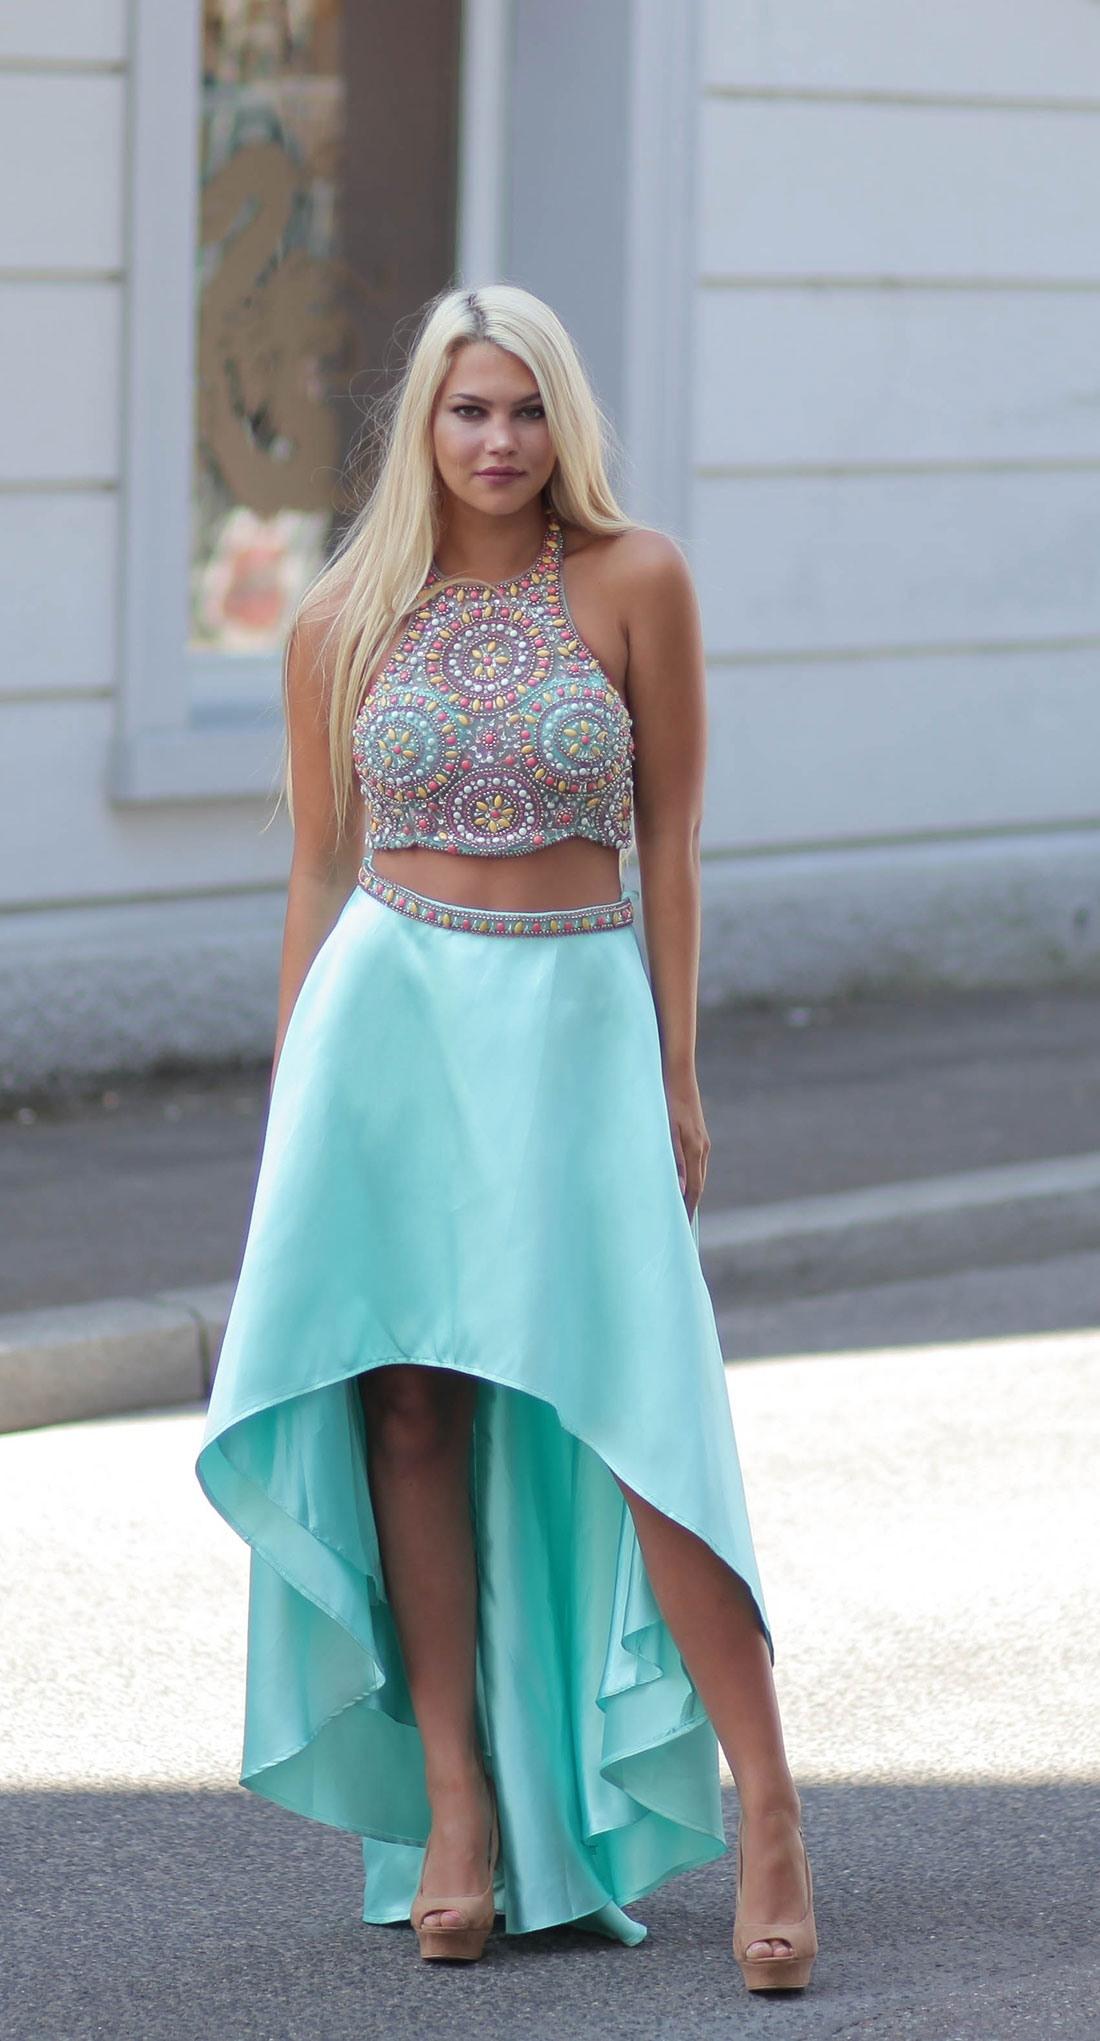 10 Elegant Abiball Kleid SpezialgebietAbend Fantastisch Abiball Kleid Design